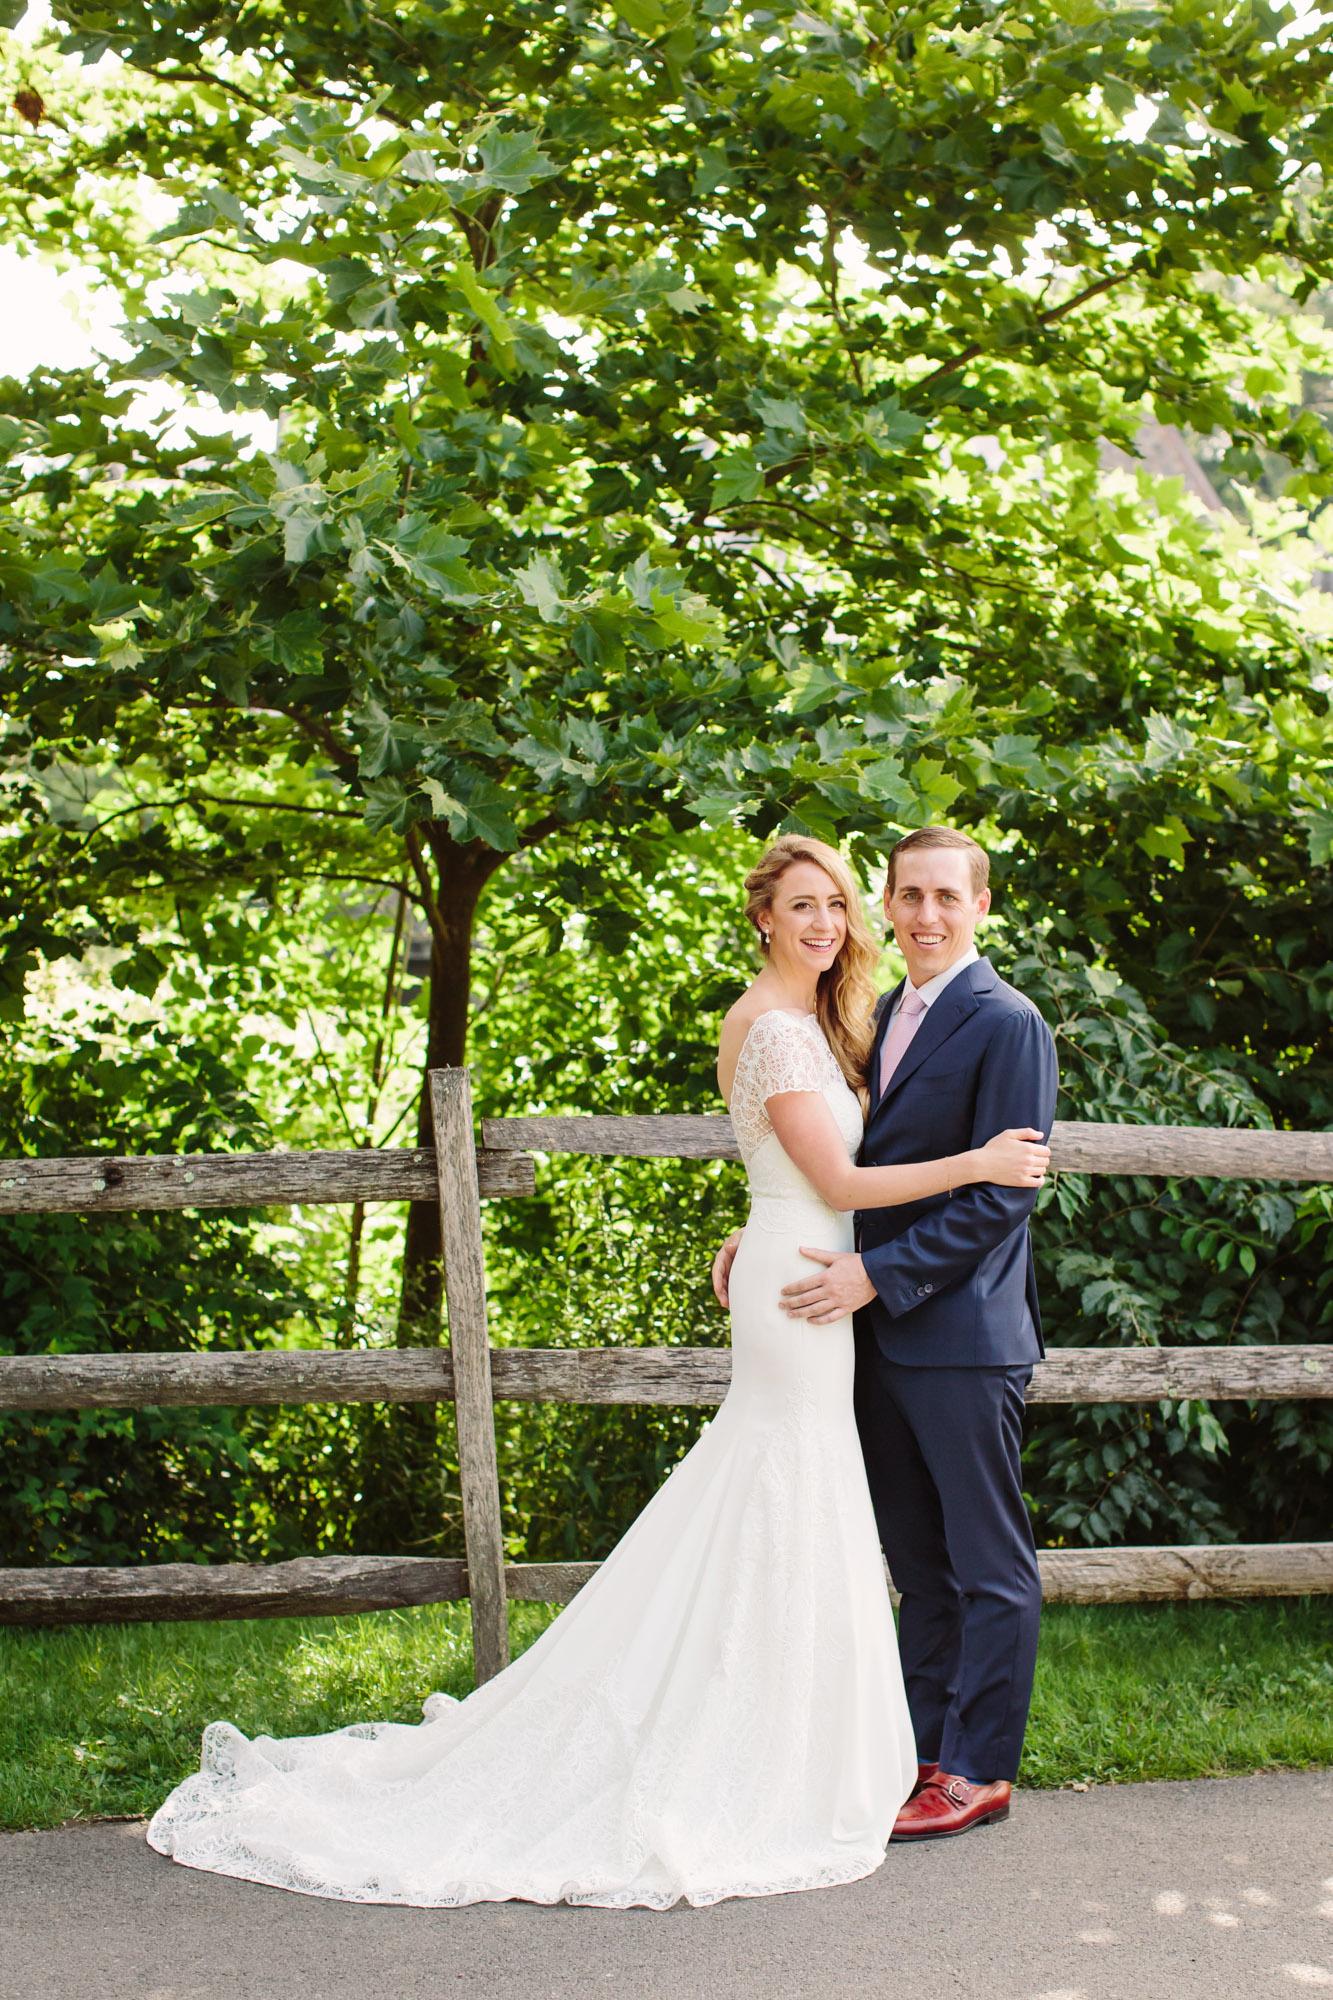 19_Jessica_Ted_Blue_Hill_Stone_Barns_Wedding_Pocantico_NY_Tanya_Salazar_Photography_085.jpg